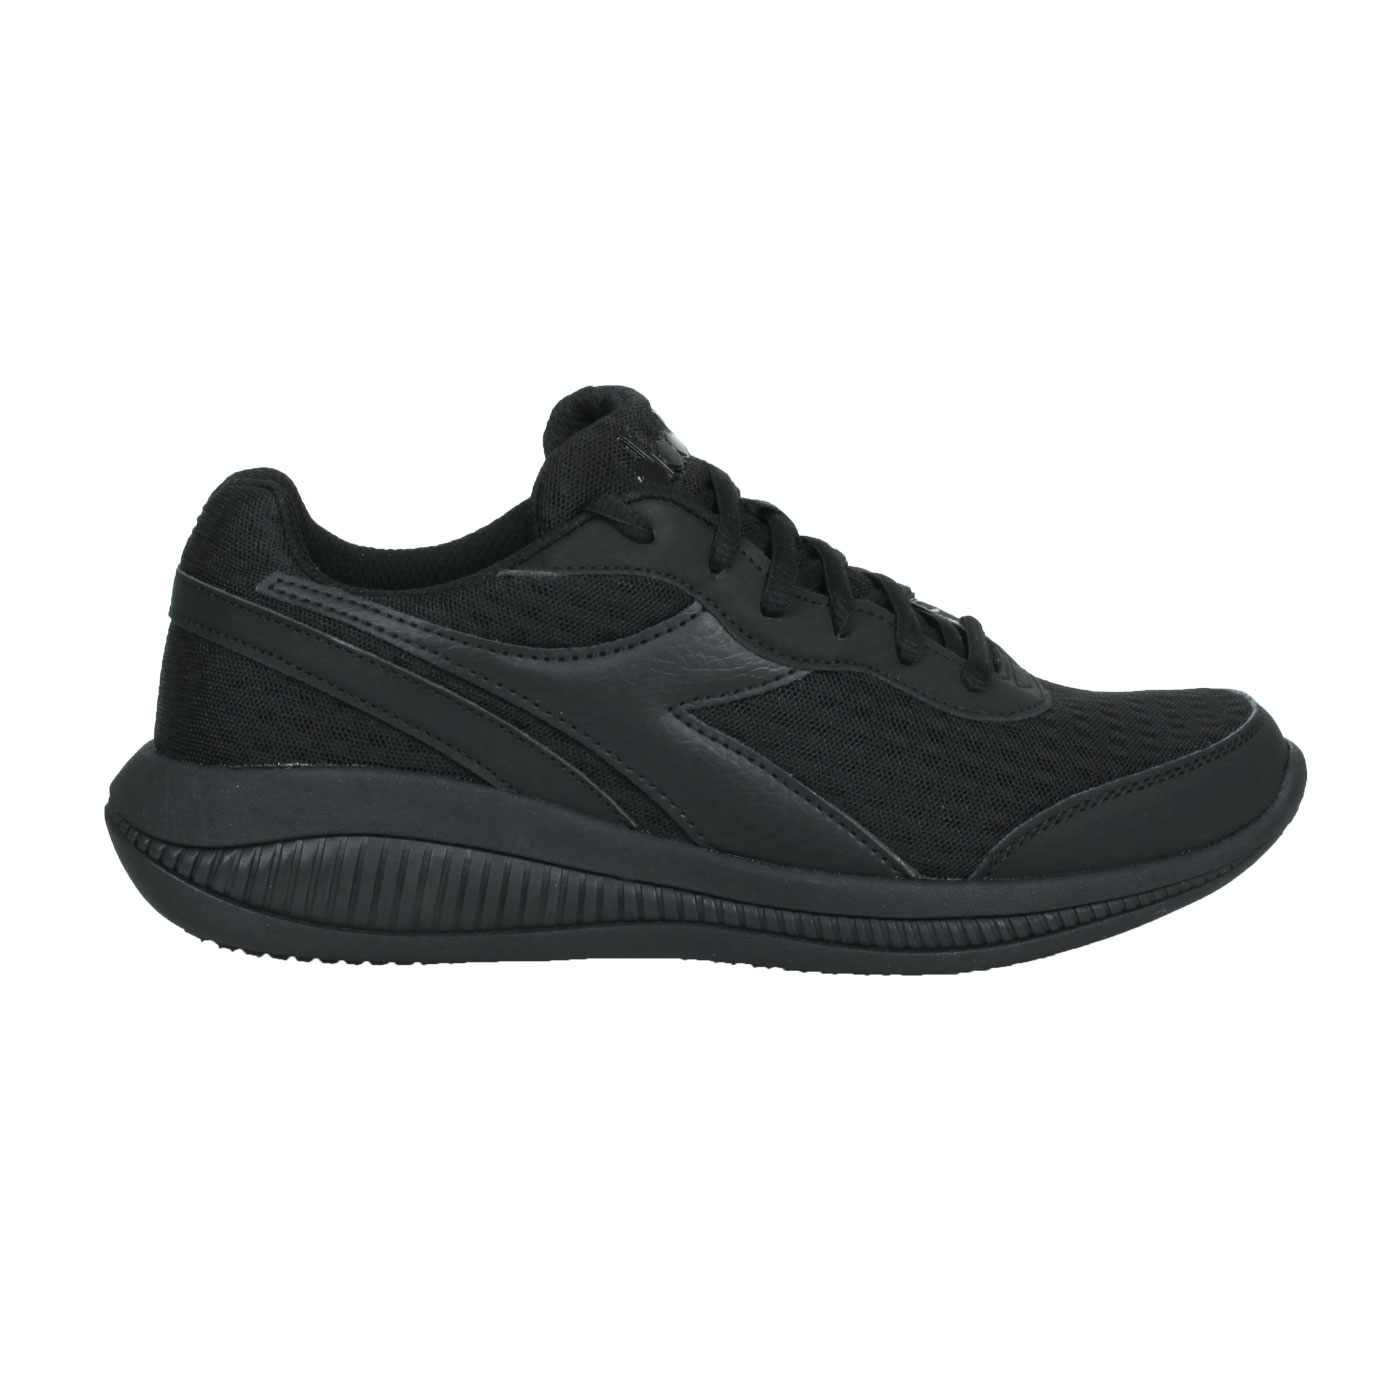 DIADORA 男款進口慢跑鞋 DA176888-C0200 - 黑